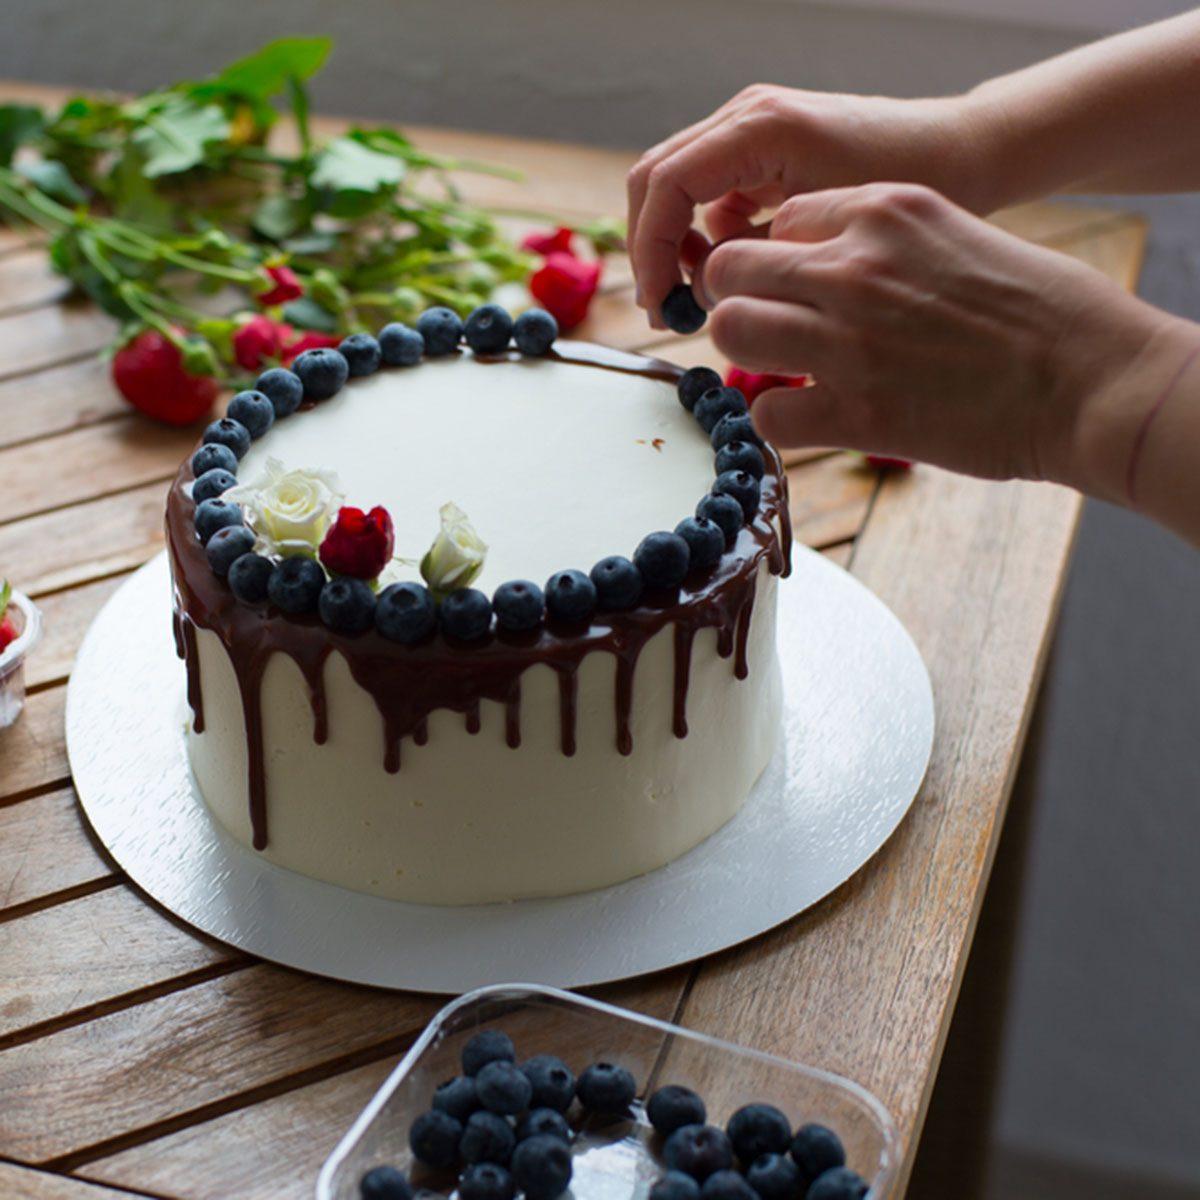 Baker adding blueberries to a cake; Shutterstock ID 645905908; Job (TFH, TOH, RD, BNB, CWM, CM): Taste of Home